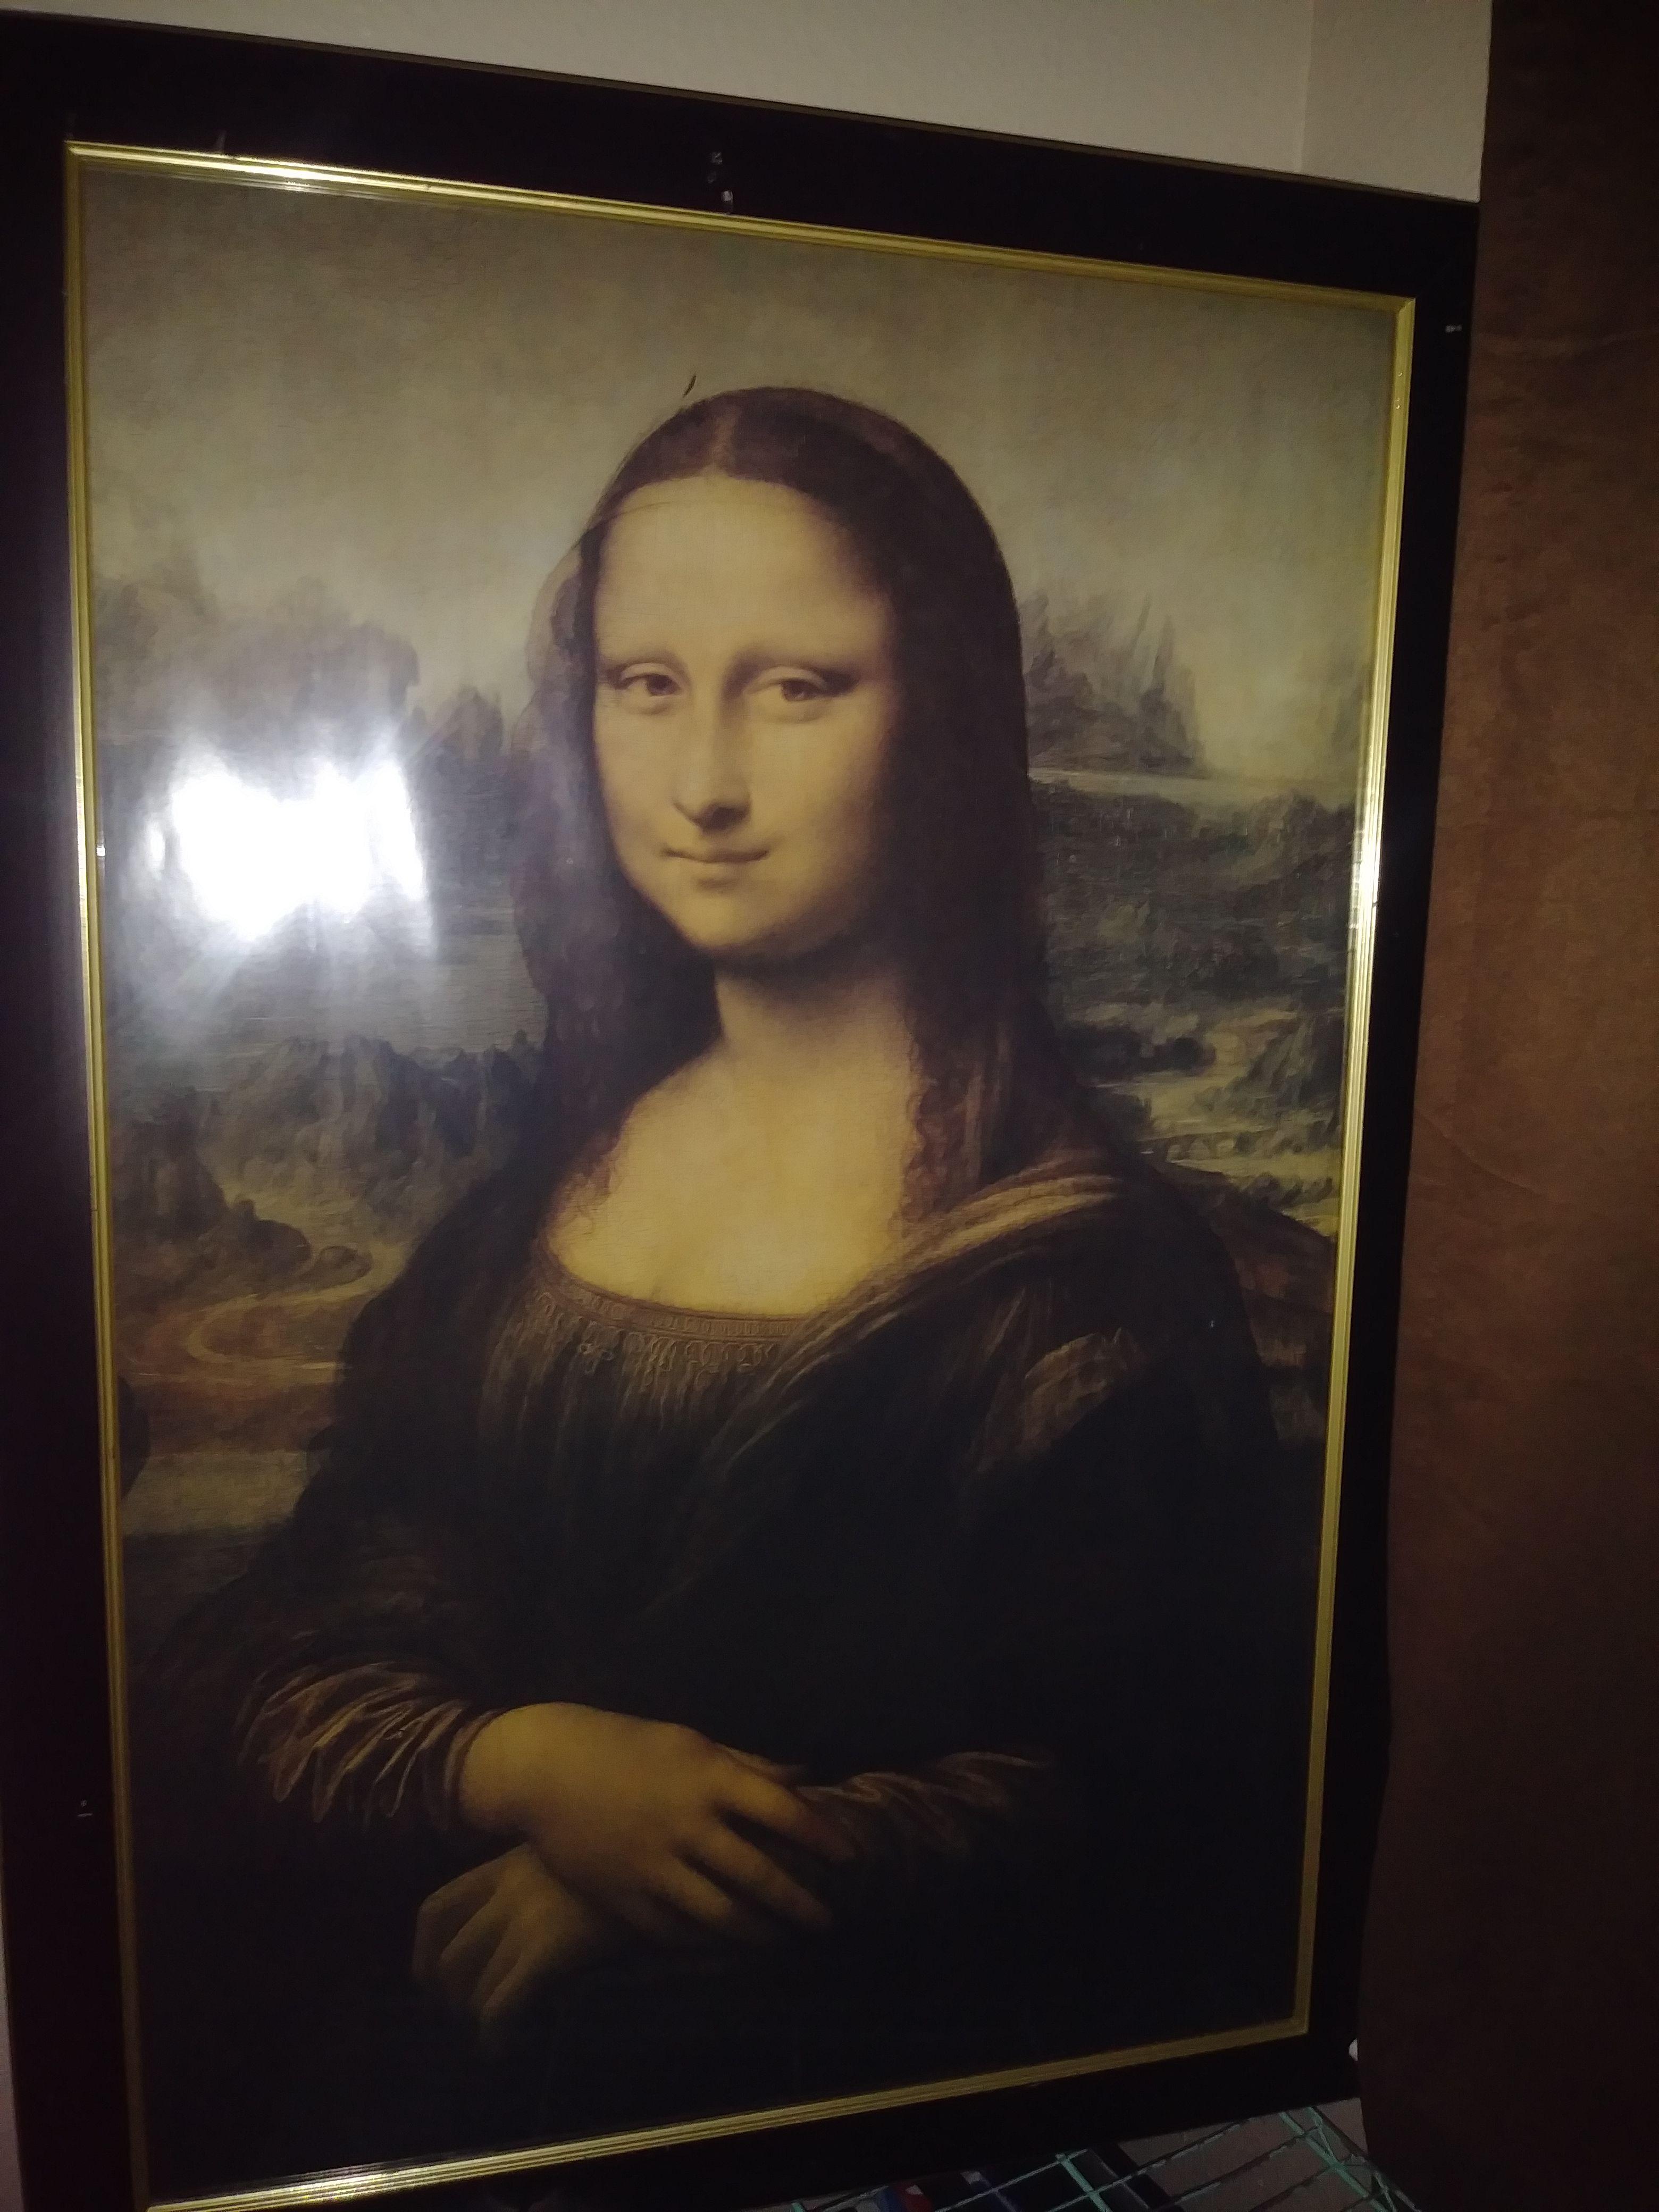 Monalisa big frame